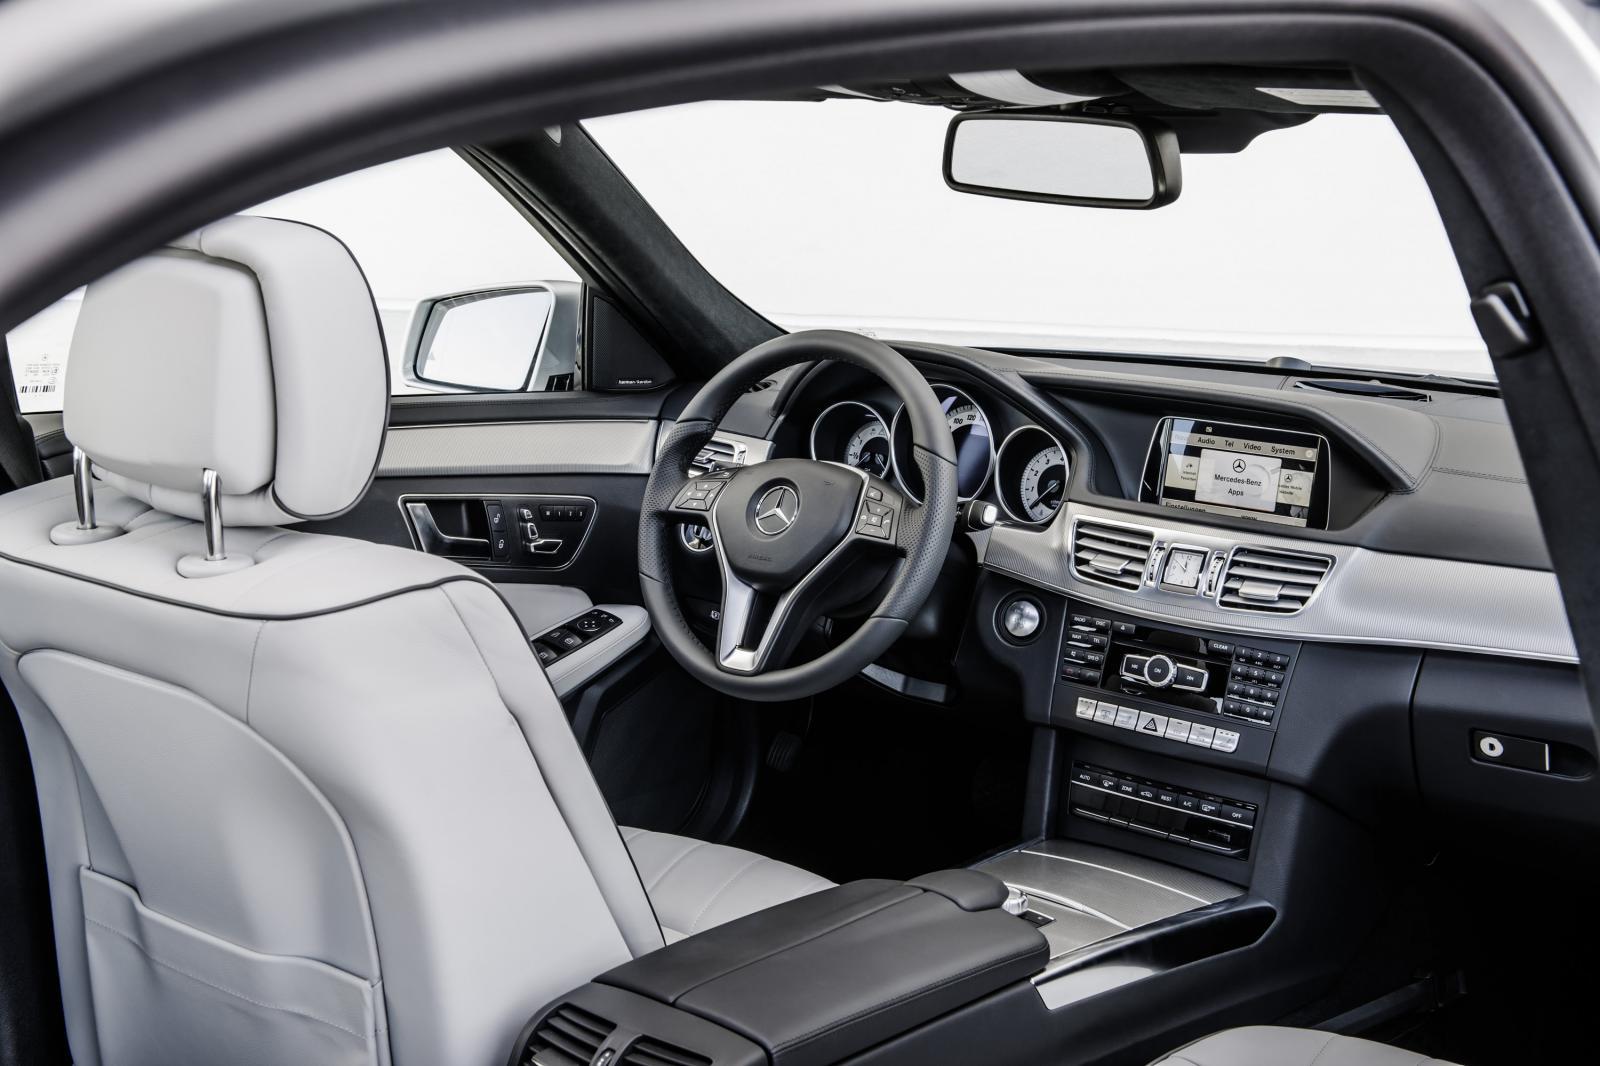 mersedes+arabalar+HEDZA+%252816%2529 Mercedes Modelleri